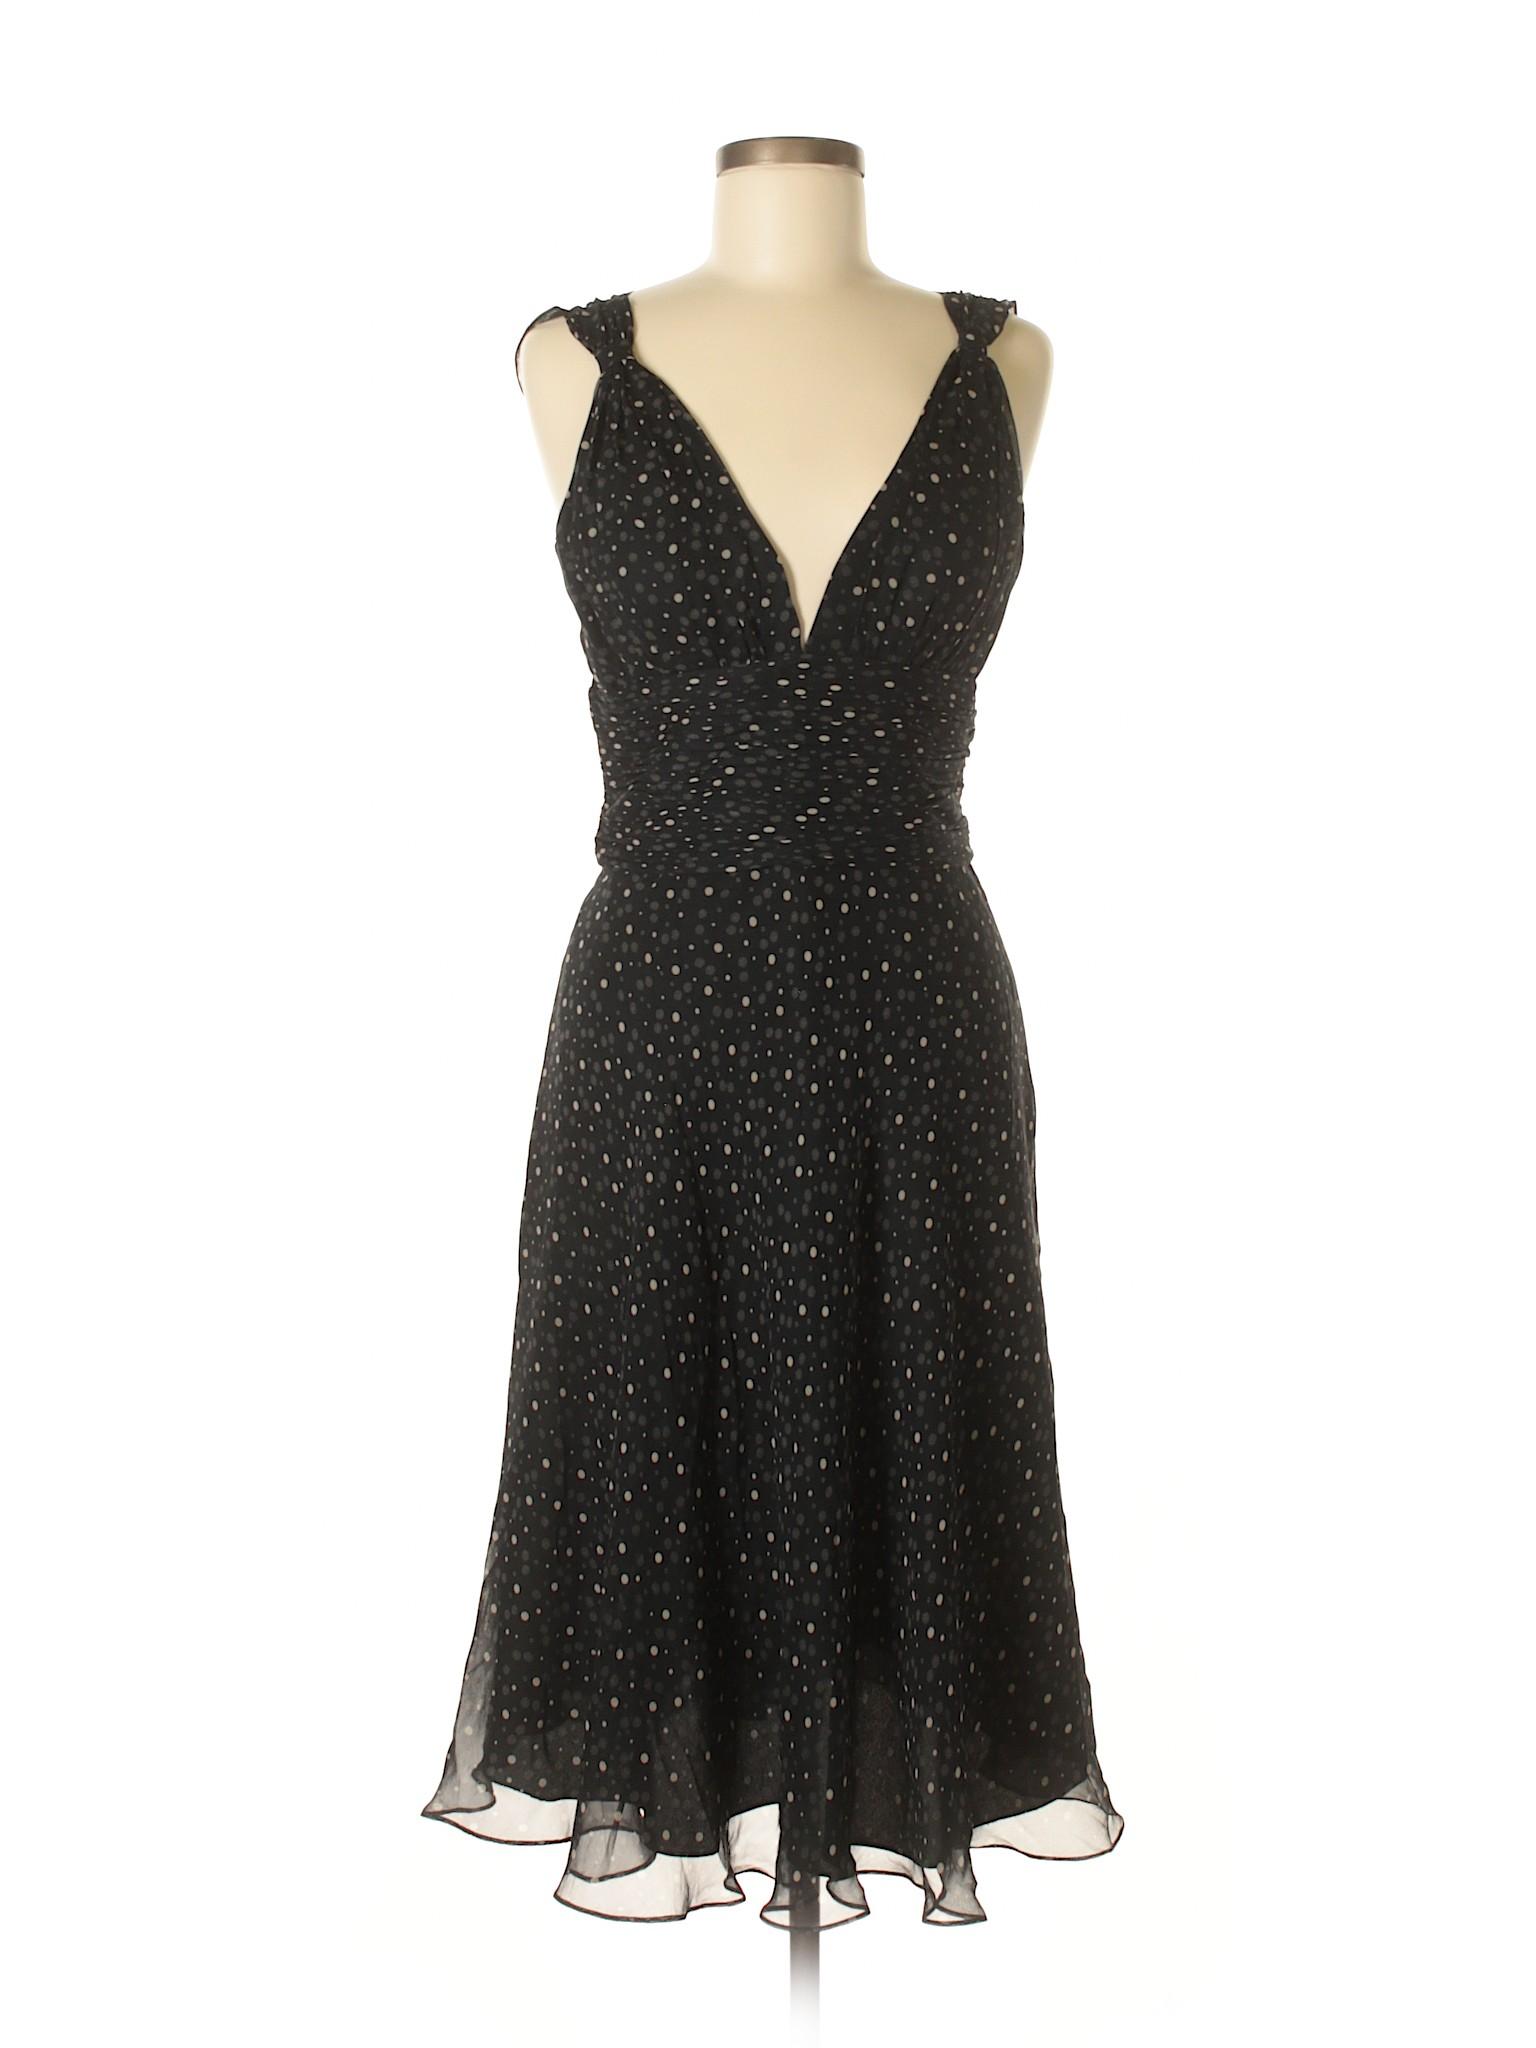 House Market Boutique Casual Black White winter Dress pxB6g